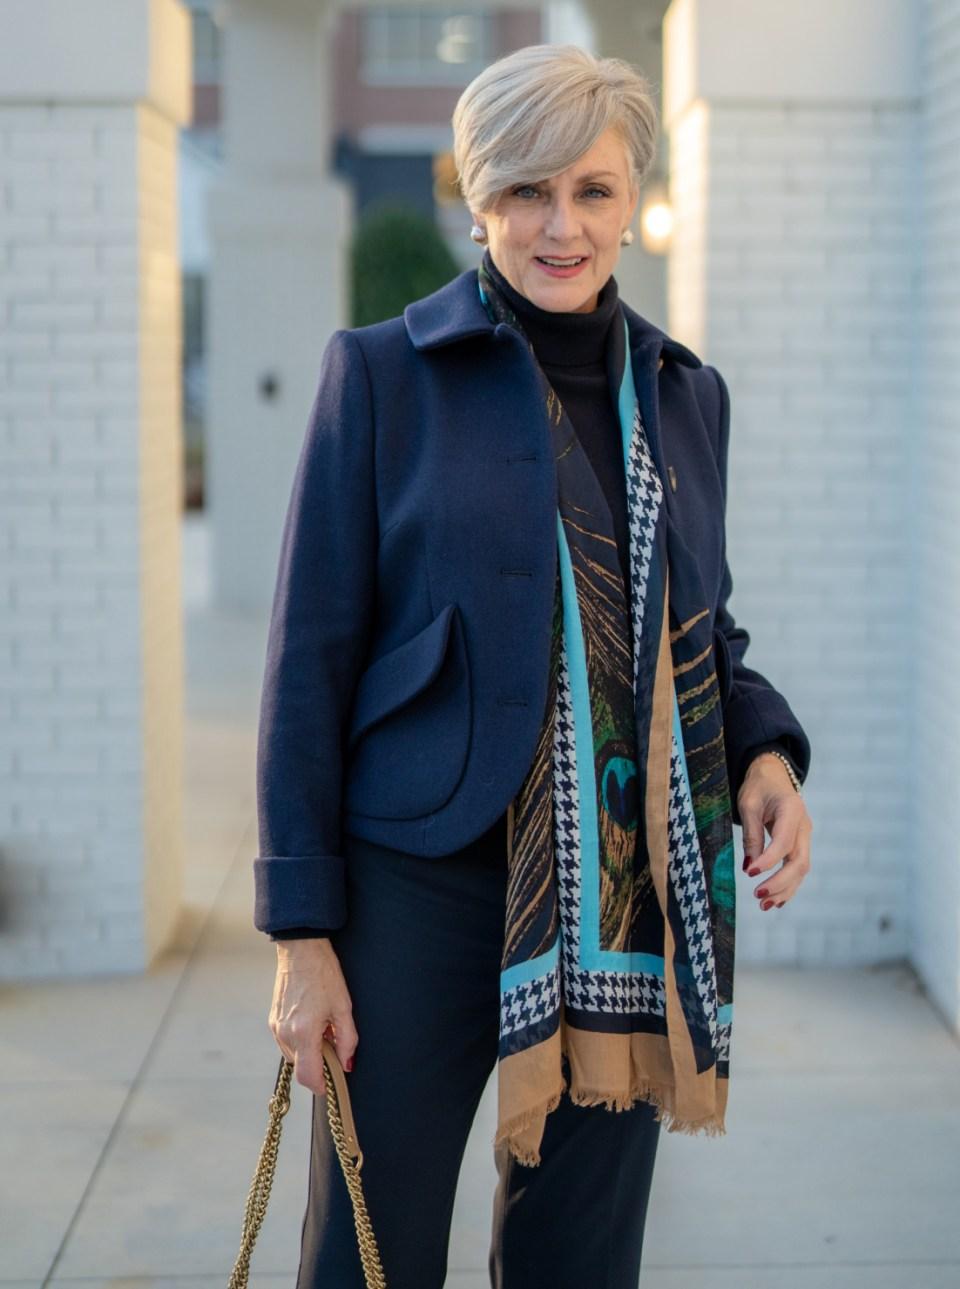 monochromatic outfit idea